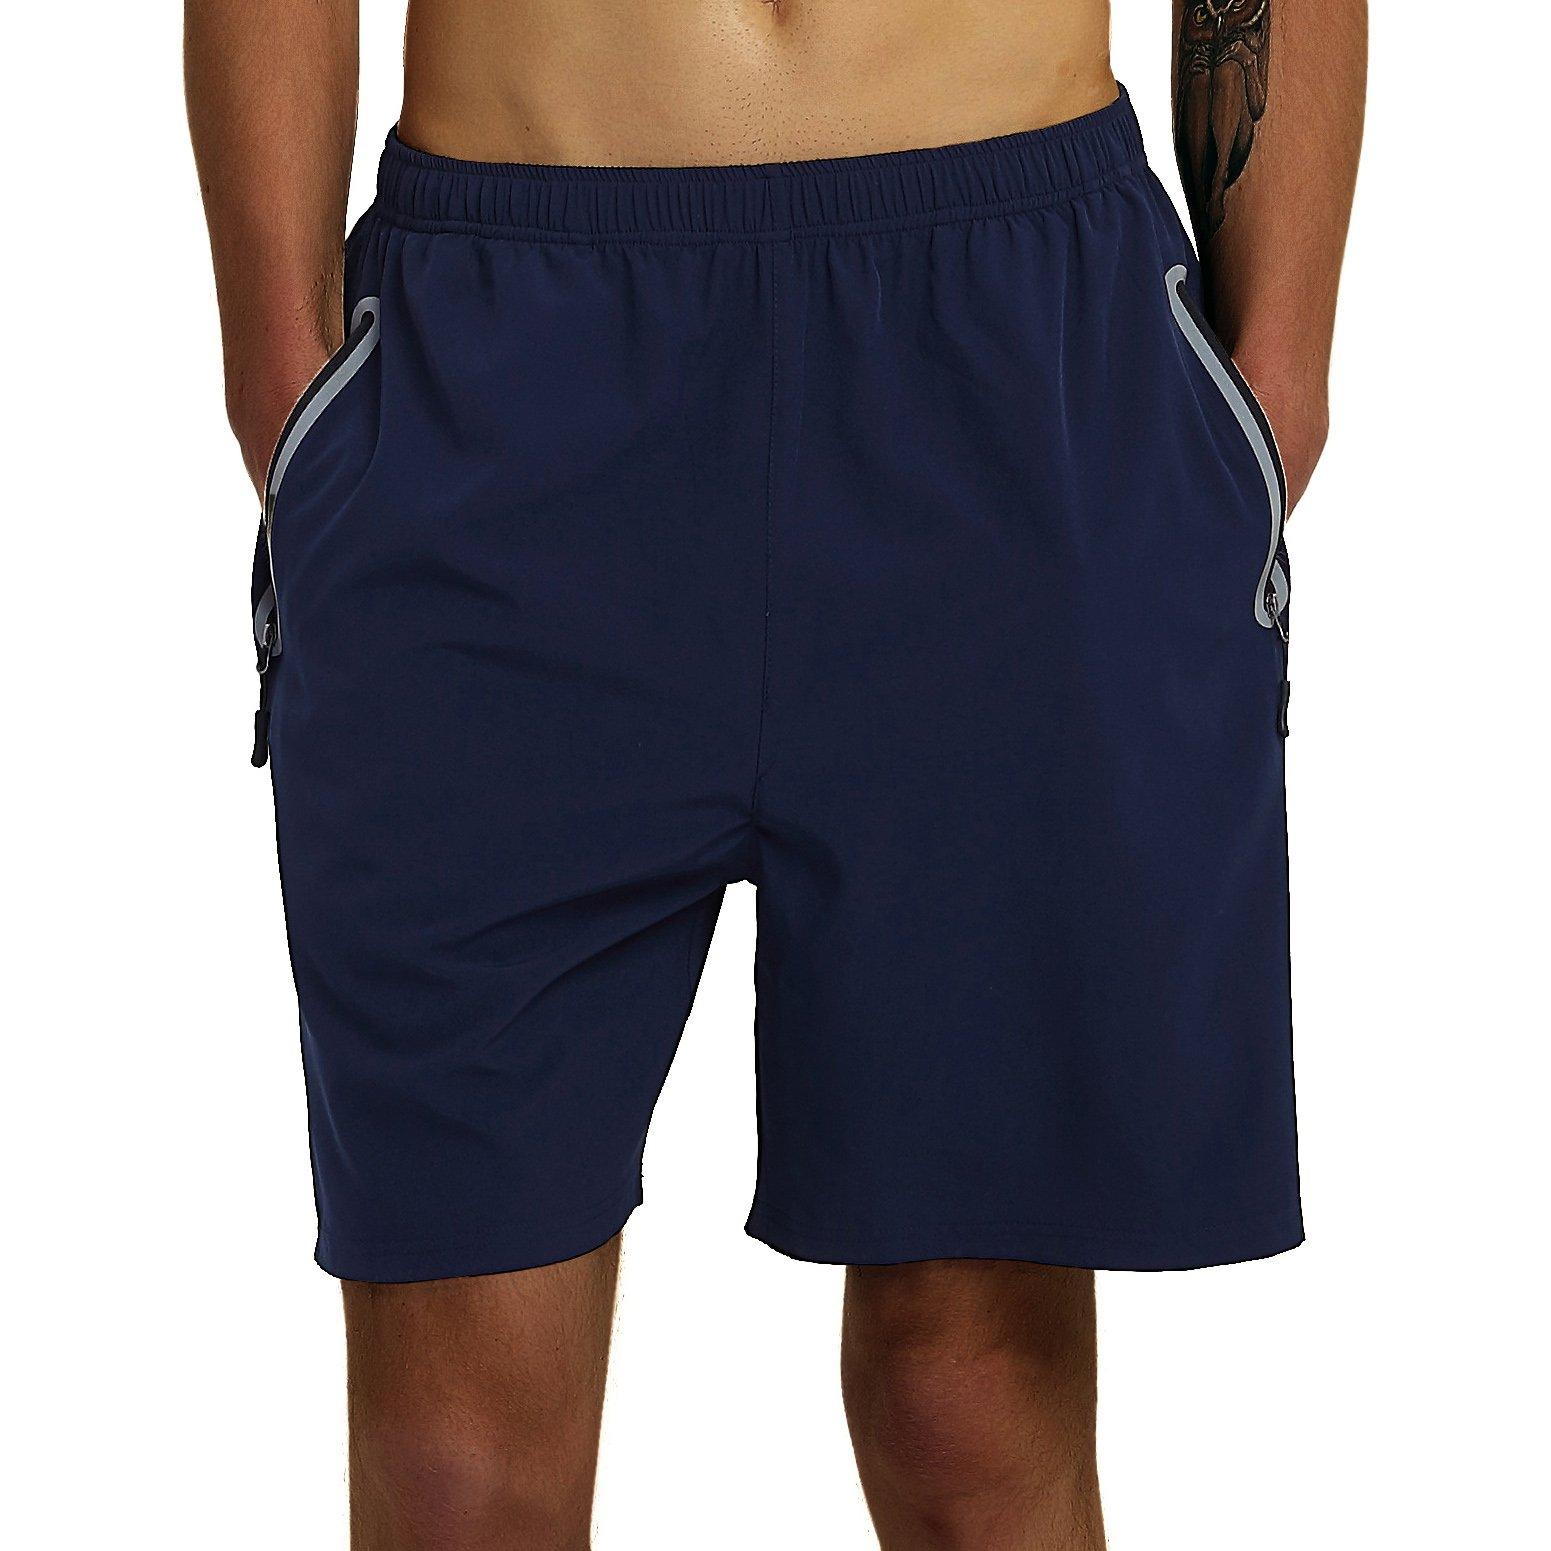 SuperArt Men\'s Gym Shorts Outdoor Sports Running Beach Shorts Lightweight Quick Dry Shorts Reflective with Zipper Pockets (Navy Blue, Medium)